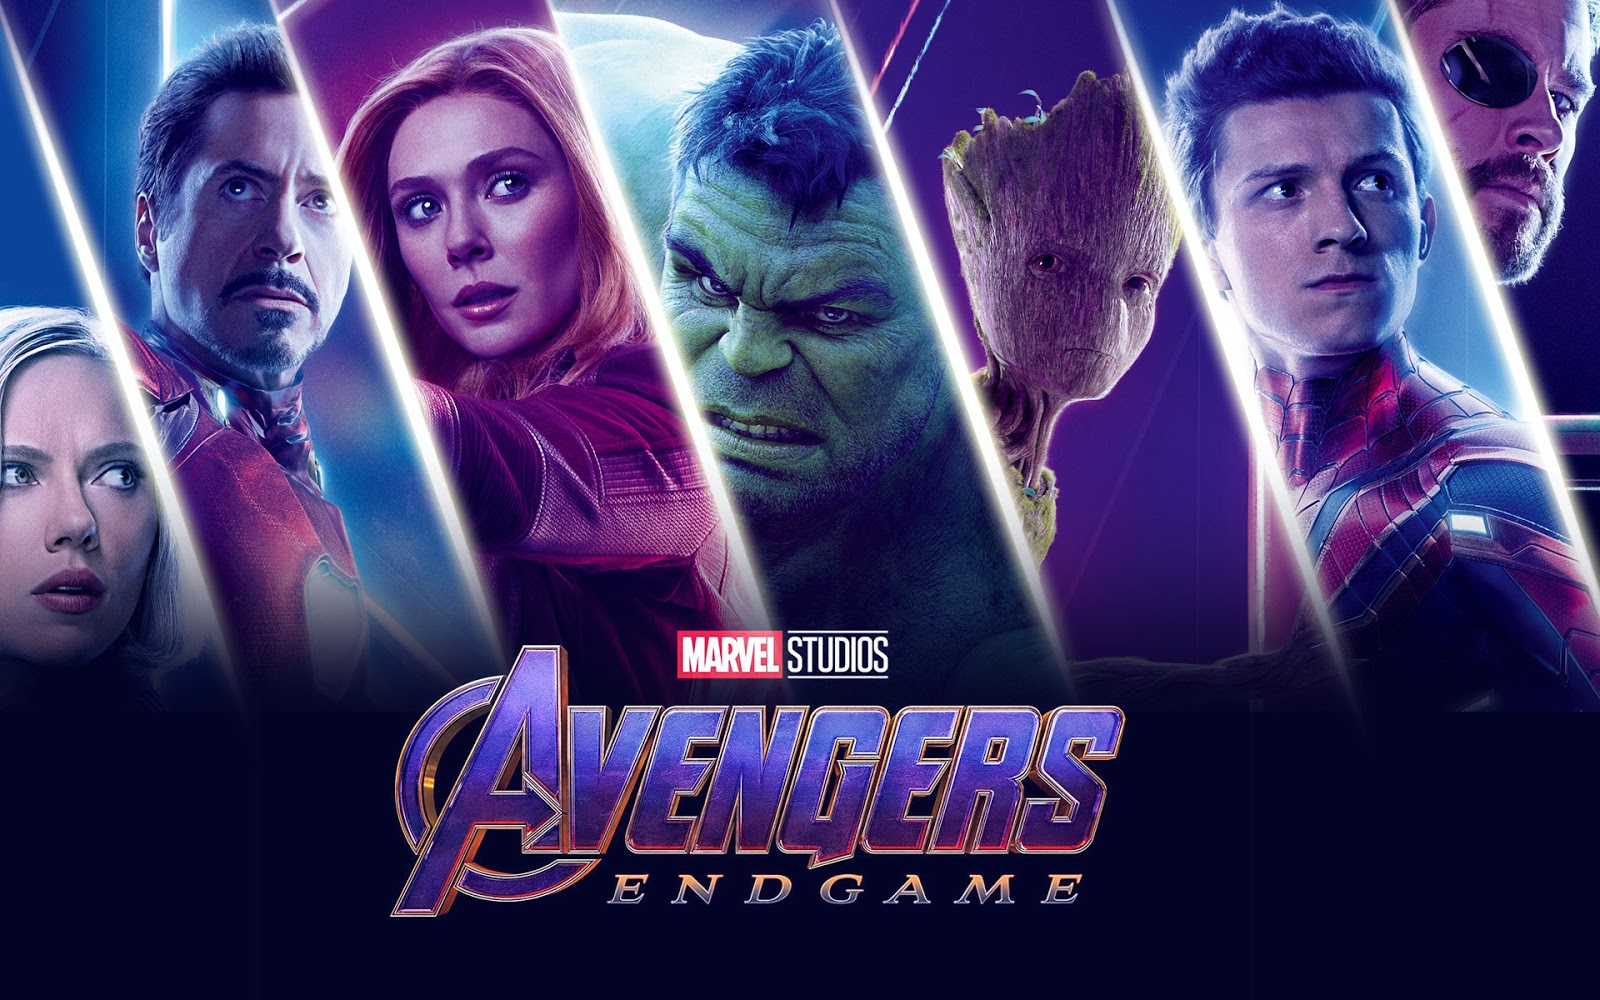 avengers endgame full movie english download free